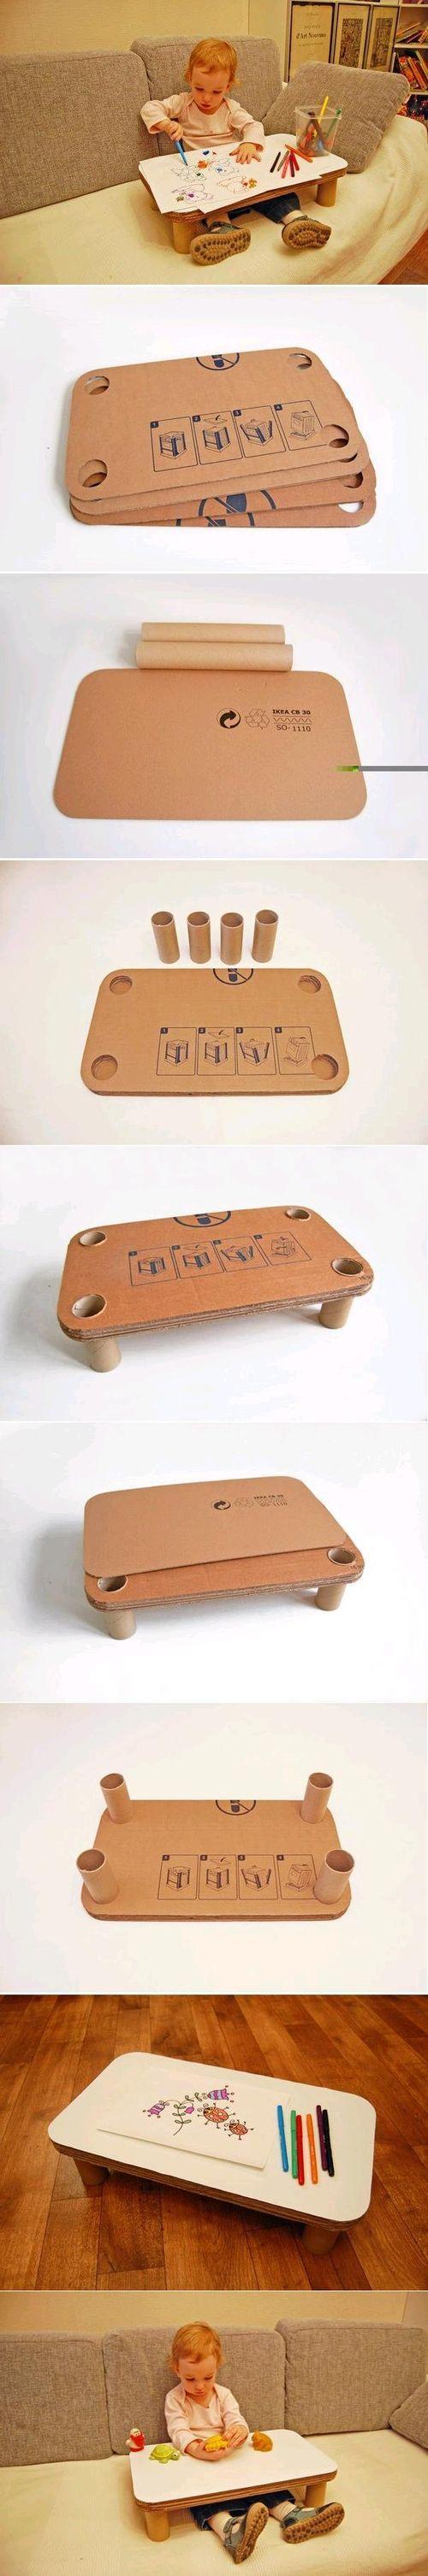 DIY Children Cardboard Table DIY Projects / UsefulDIY.com on imgfave